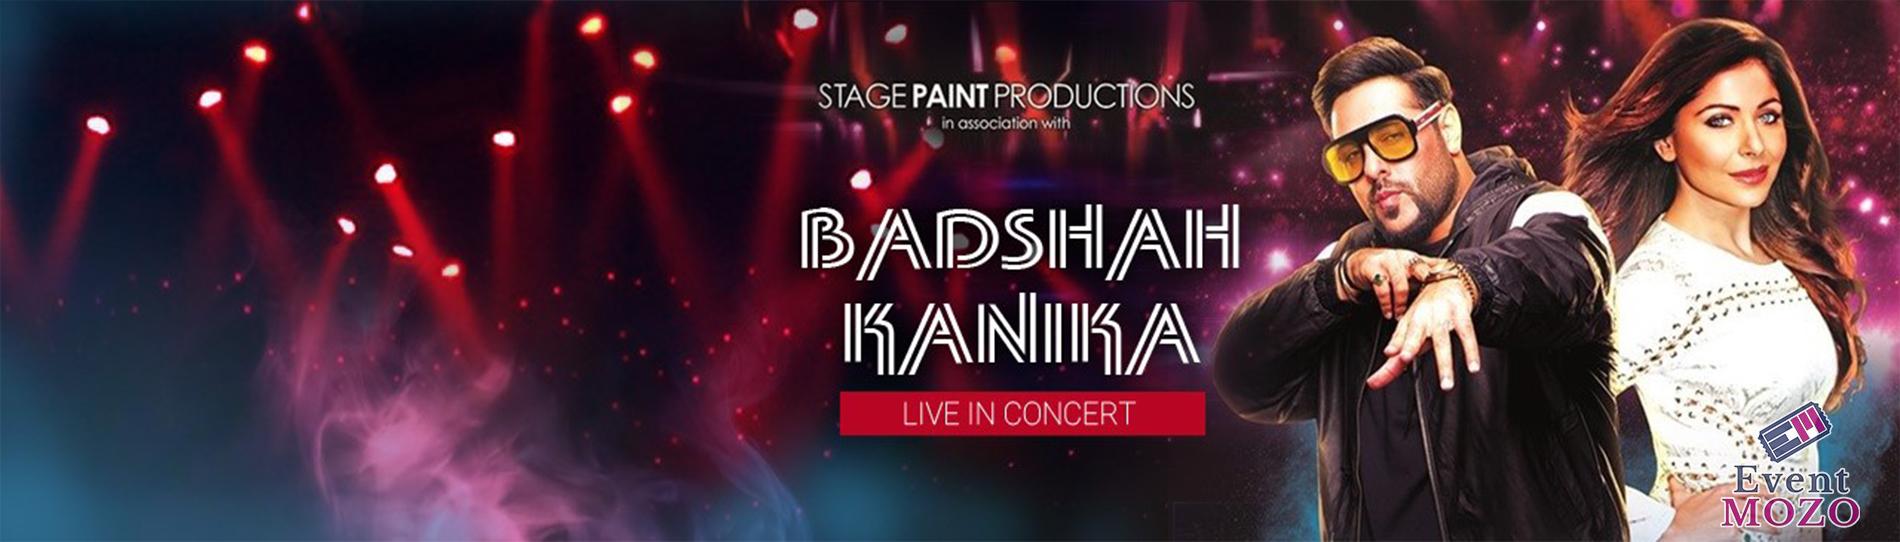 EventMozo BADSHAH - KANIKA Live In Concert - Los Angeles